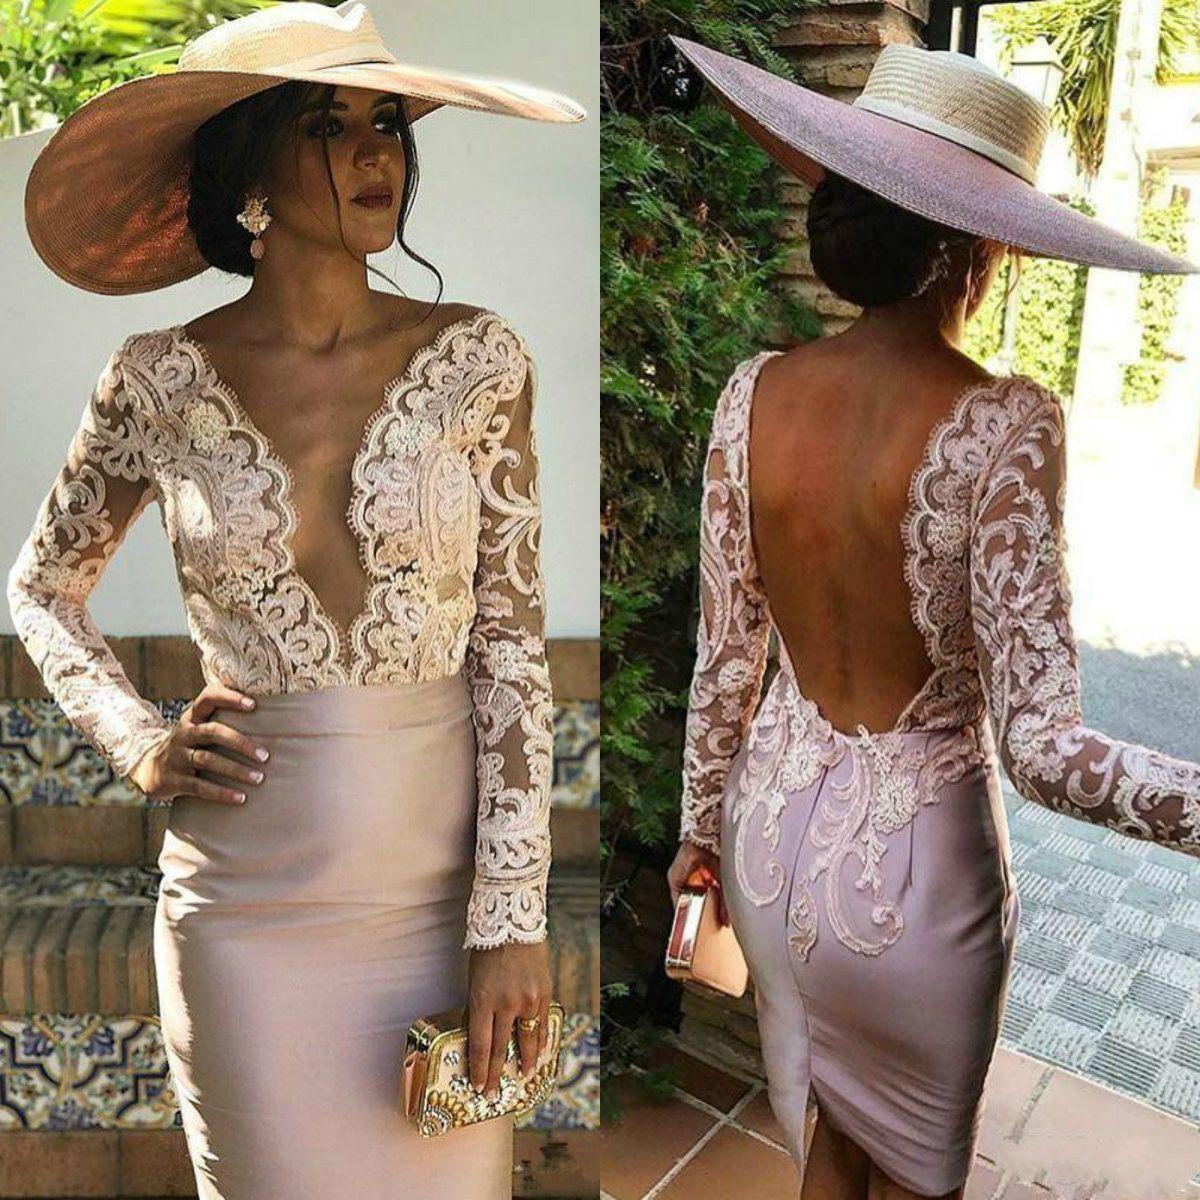 Blush Pink Elegant Mother Of The Bride Dresses For Wedding V Neck Long Sleeve Women Dress Lace Appliqued Plus Size Evening Gowns